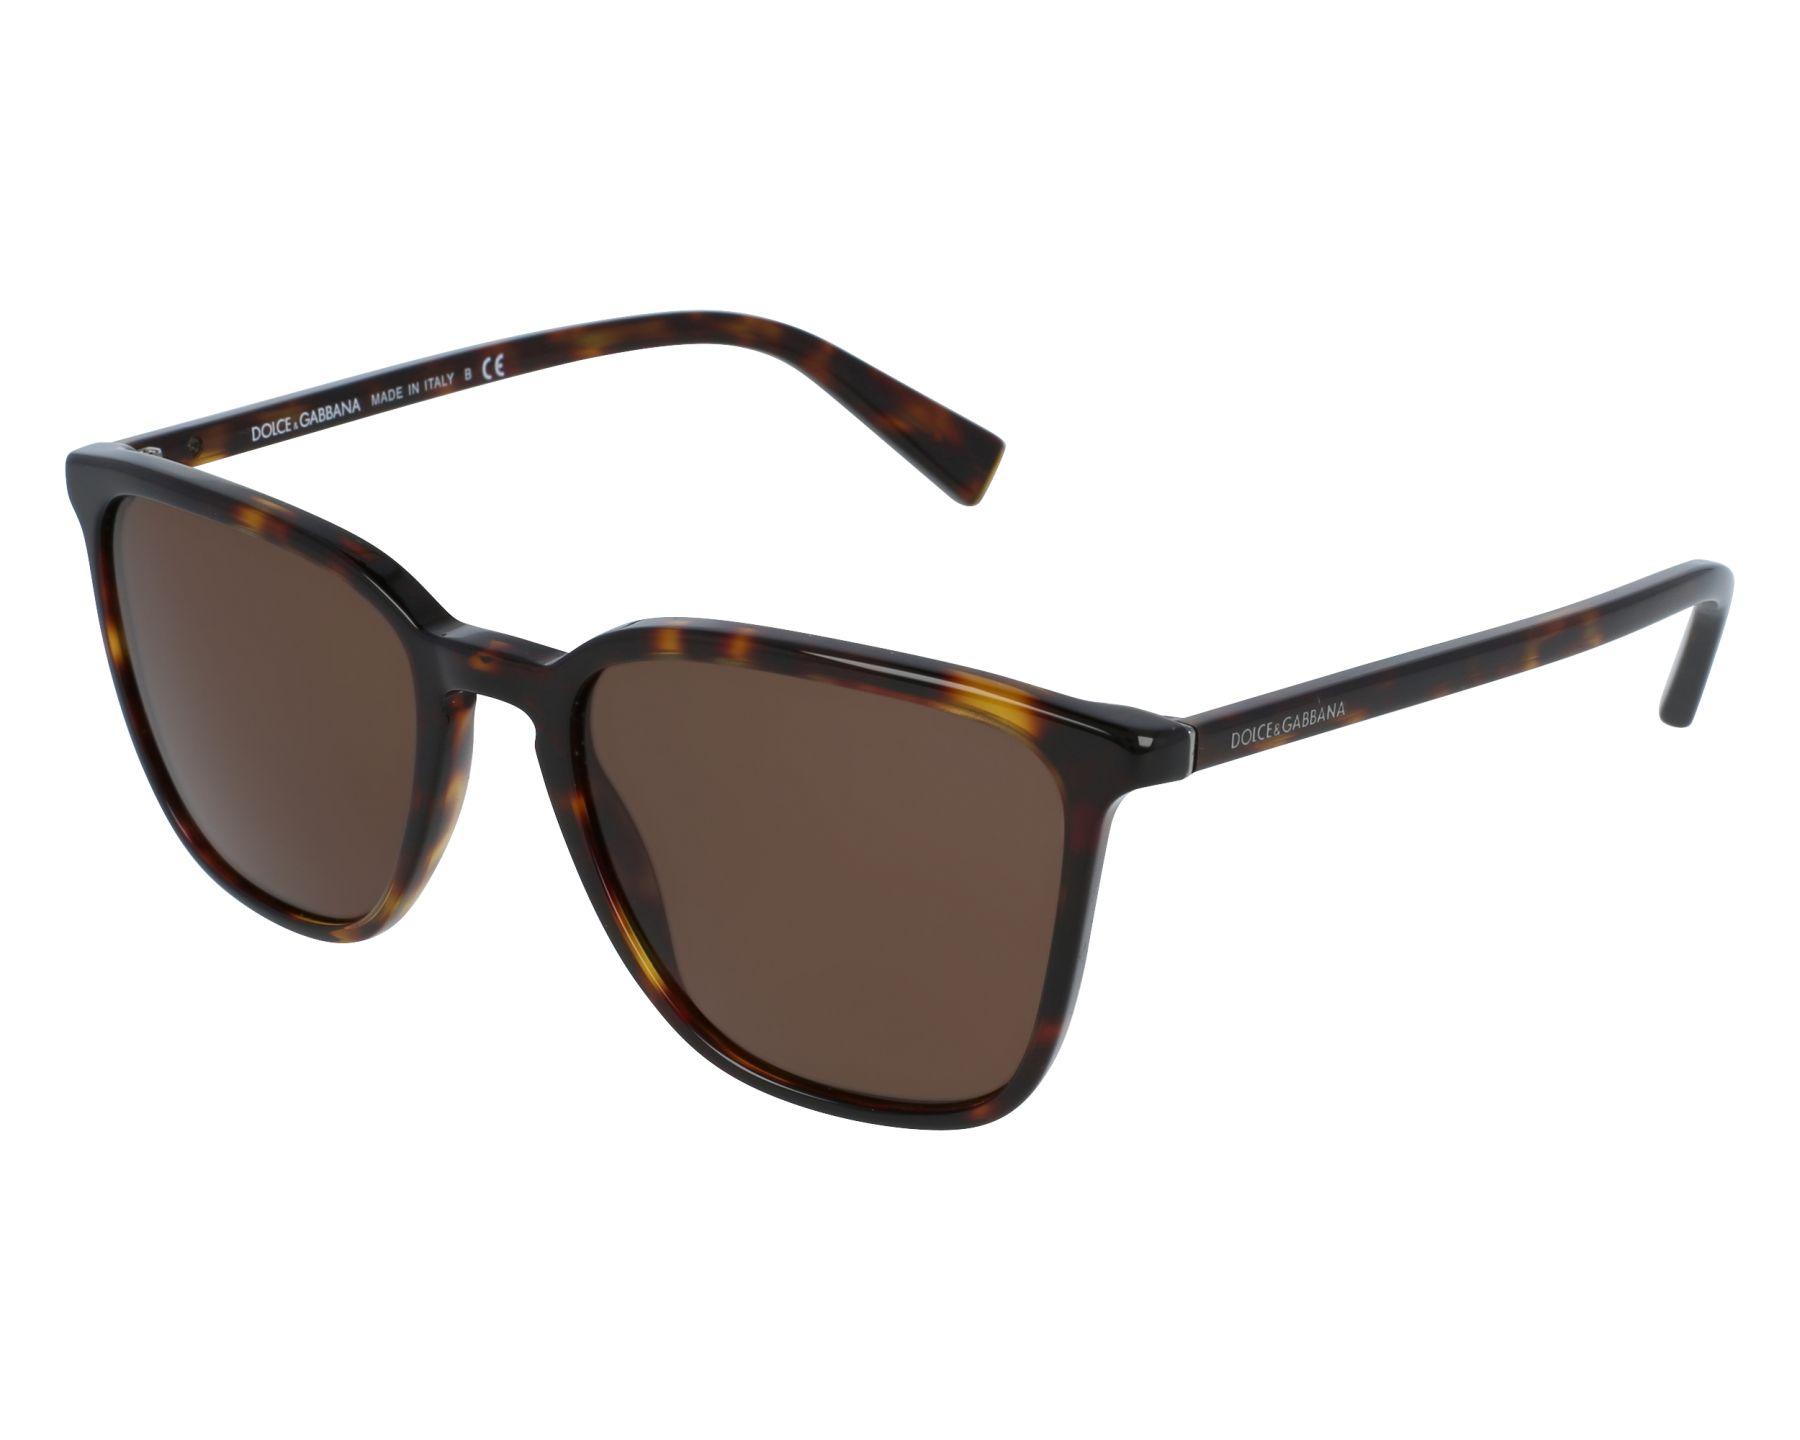 a9c8b6395ed Sunglasses Dolce   Gabbana DG-4301 502 73 53-19 Havana front view